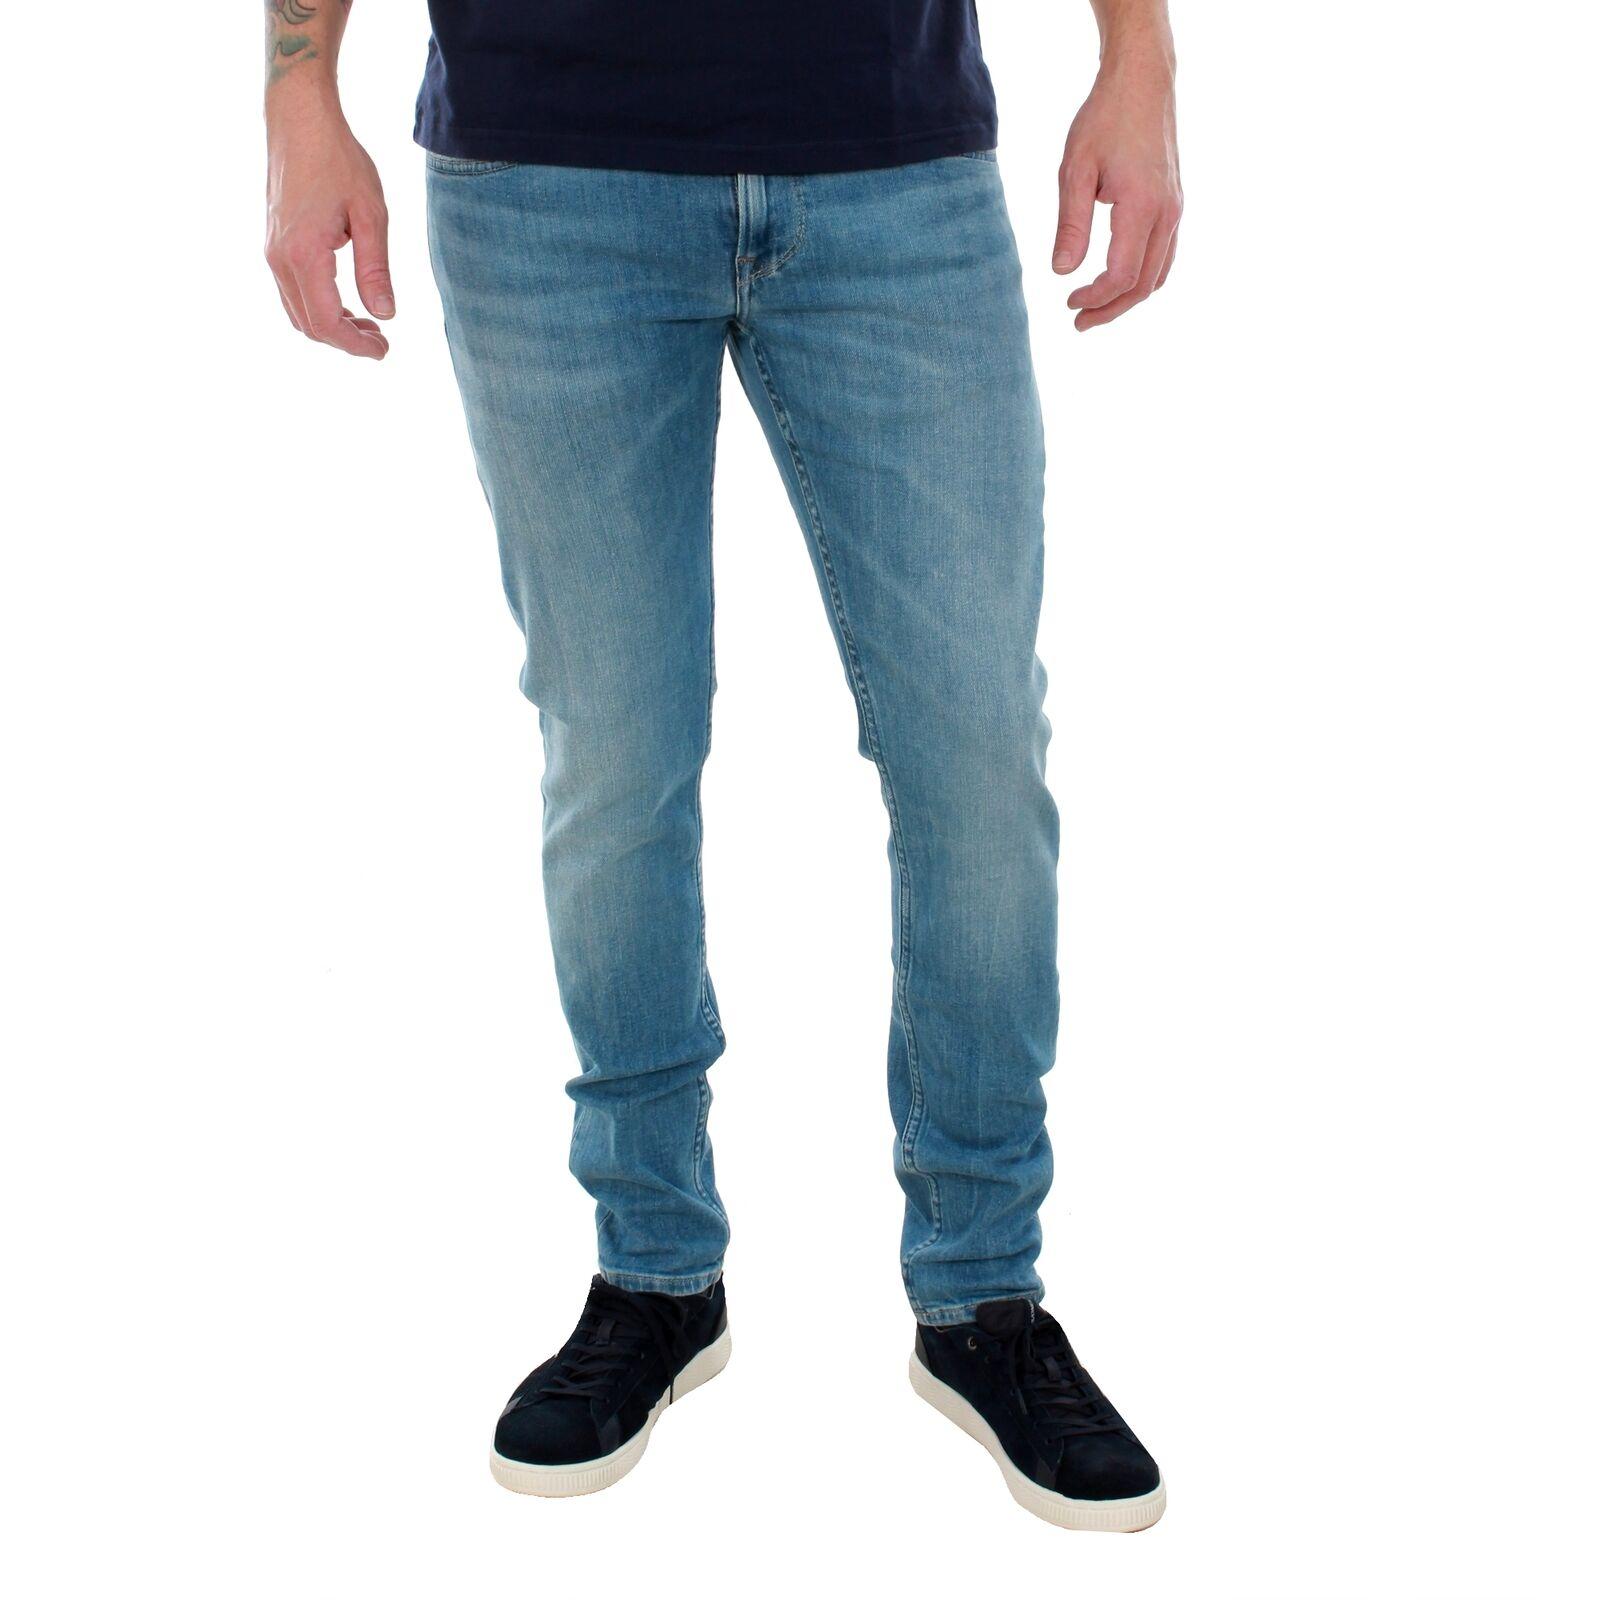 Pepe Jeans Hombre Jeans pantalón low high waist blue 20964-60